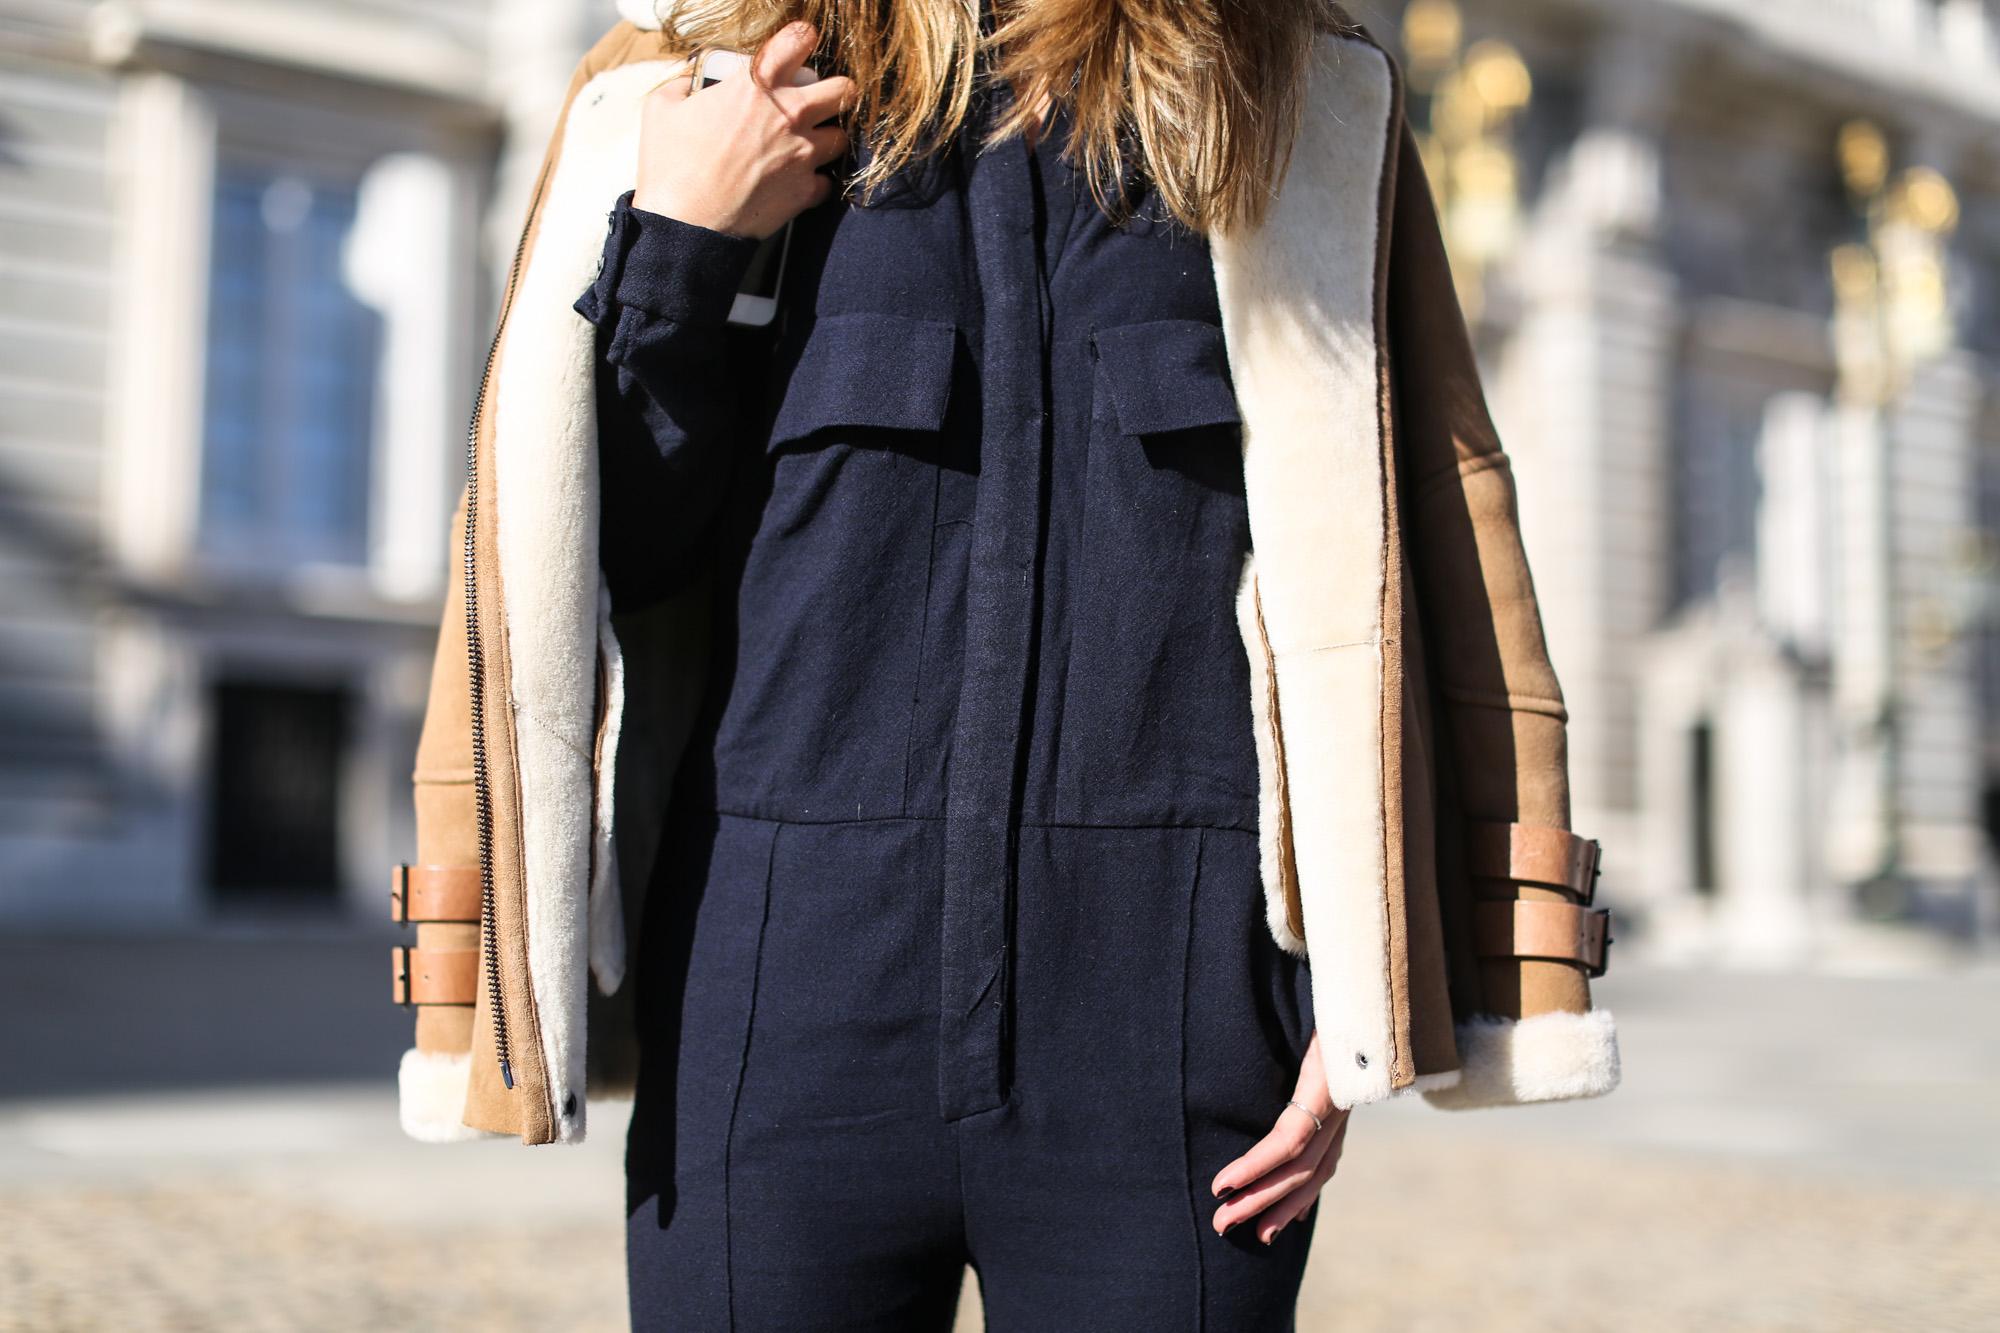 Clochet_streetstyle_mango_suede_leather_aviator_coat_adidas_samba_leztinstreet-13